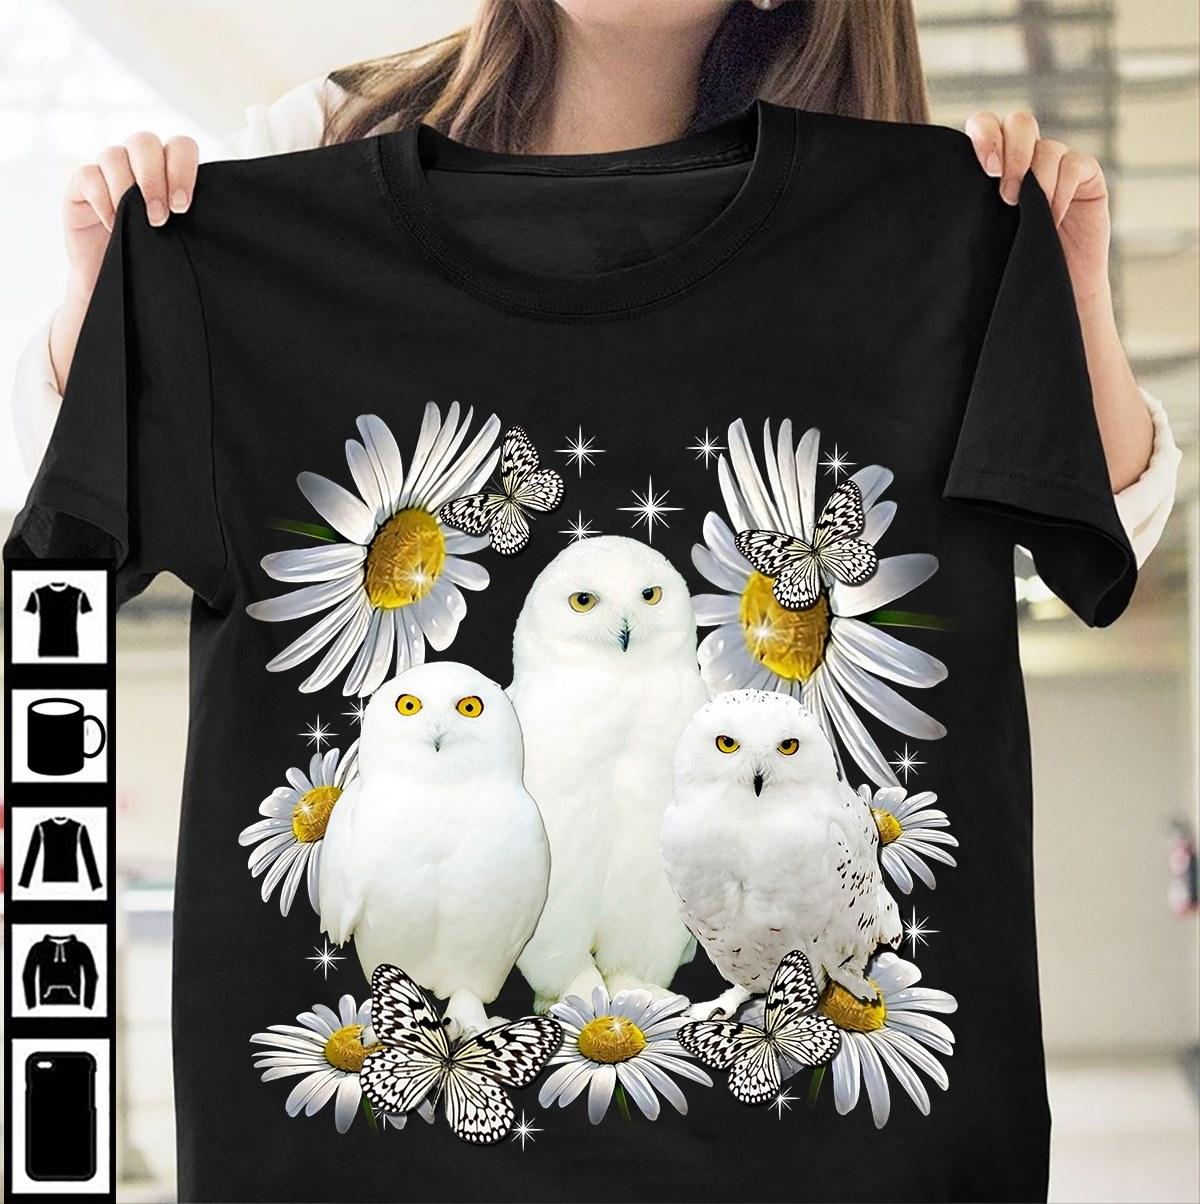 Cute White Owl Shirt Daisy Butterfly